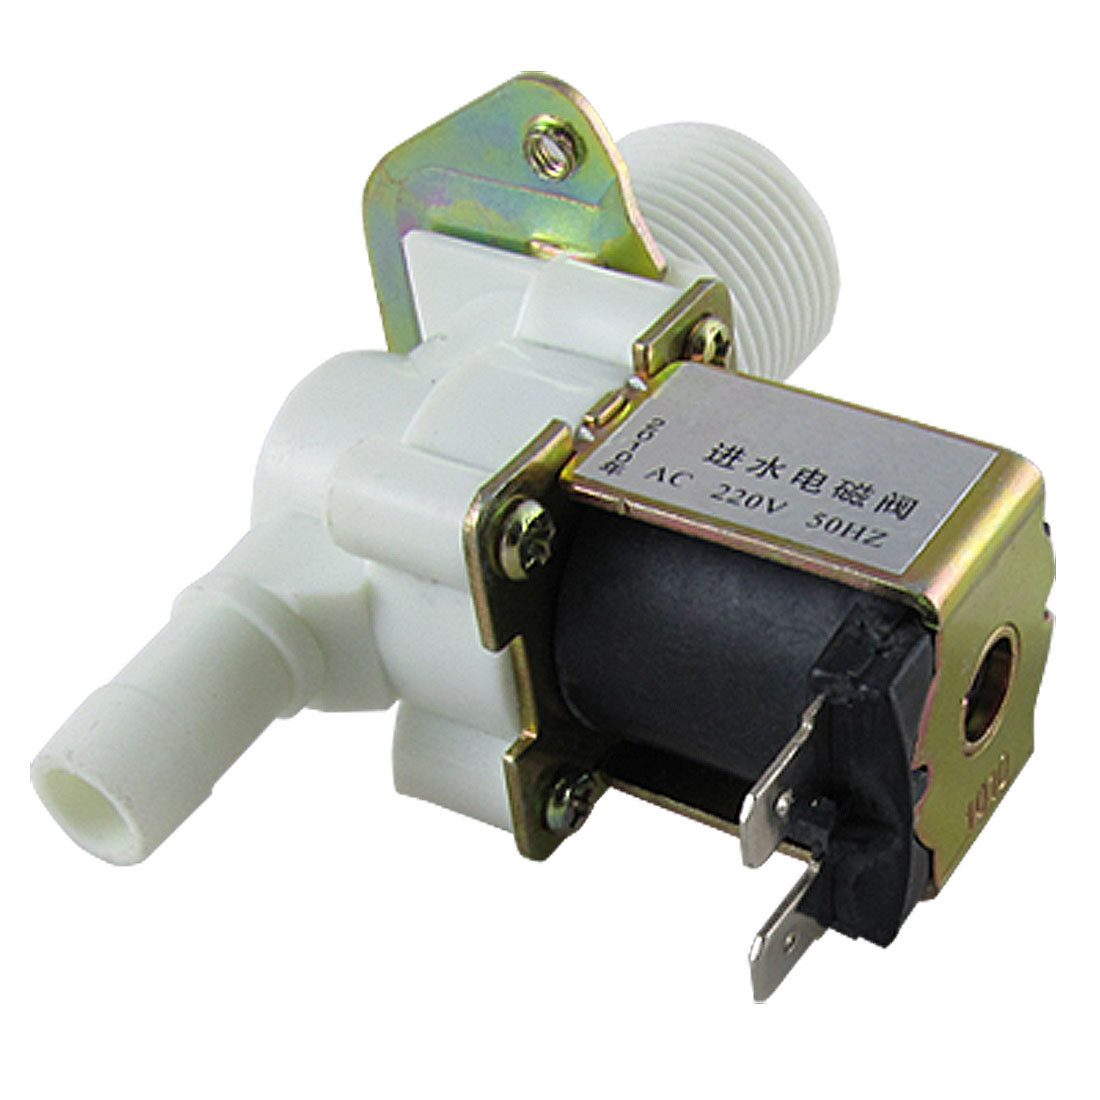 solenoid valve for washing machine